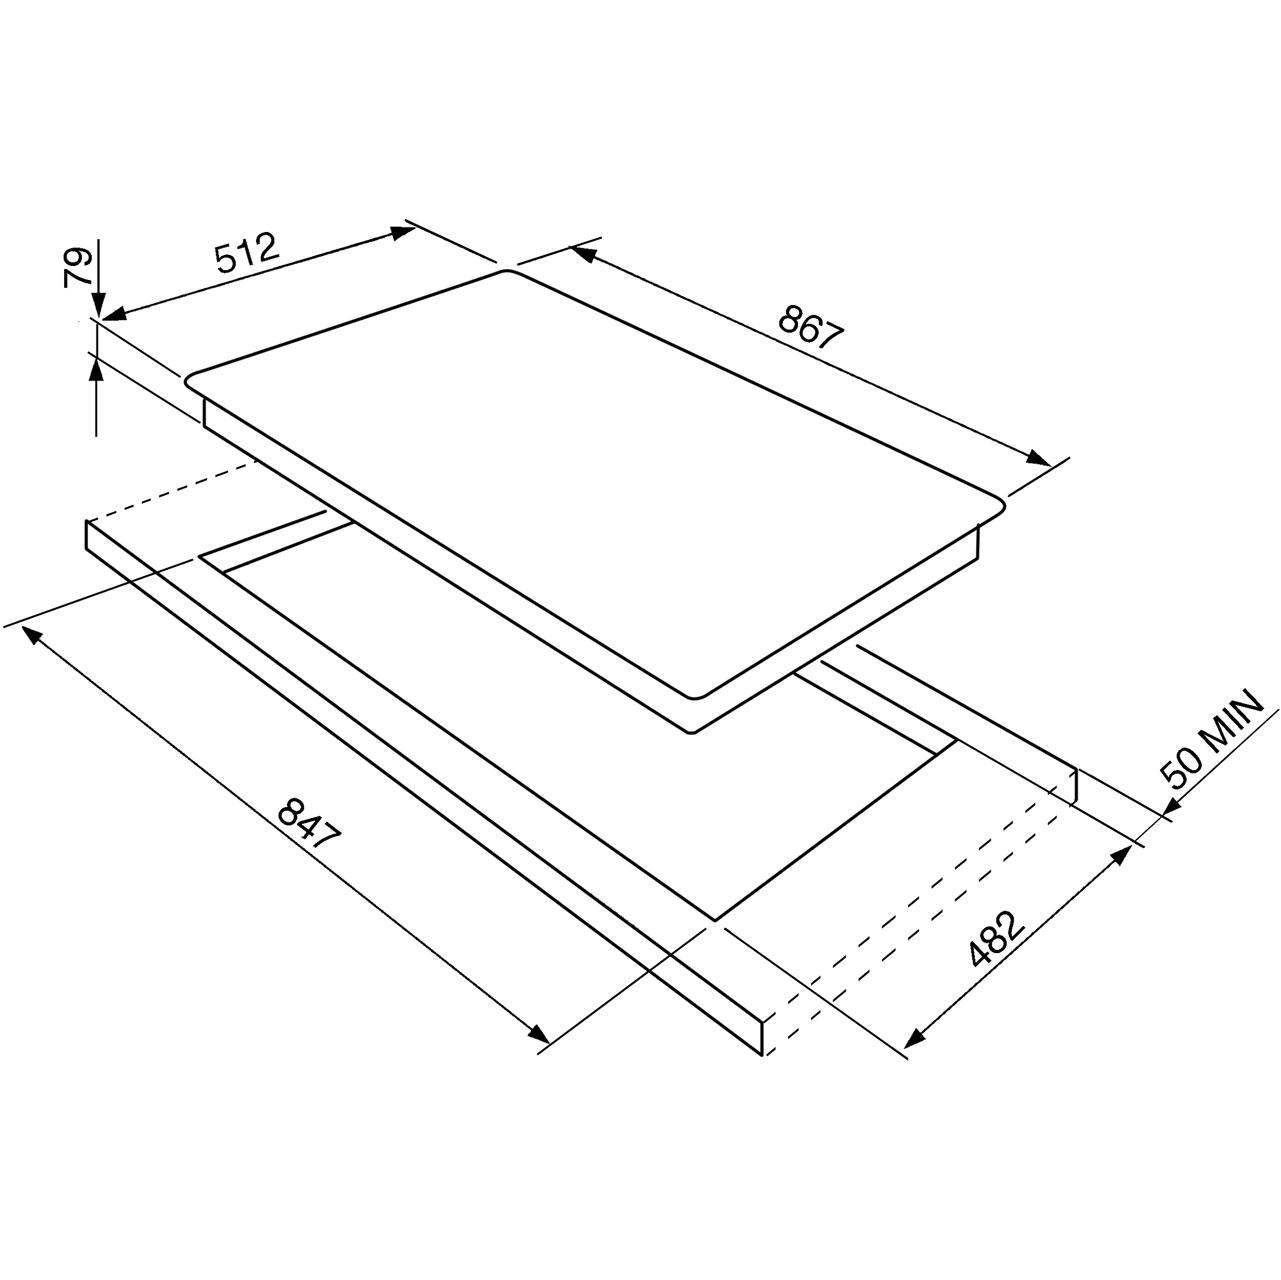 pgf95 4_ss_smeg_gashob_dim_l?resize=665%2C664 smeg wall oven wiring diagram the best wiring diagram 2017 aeg oven wiring diagram at bayanpartner.co